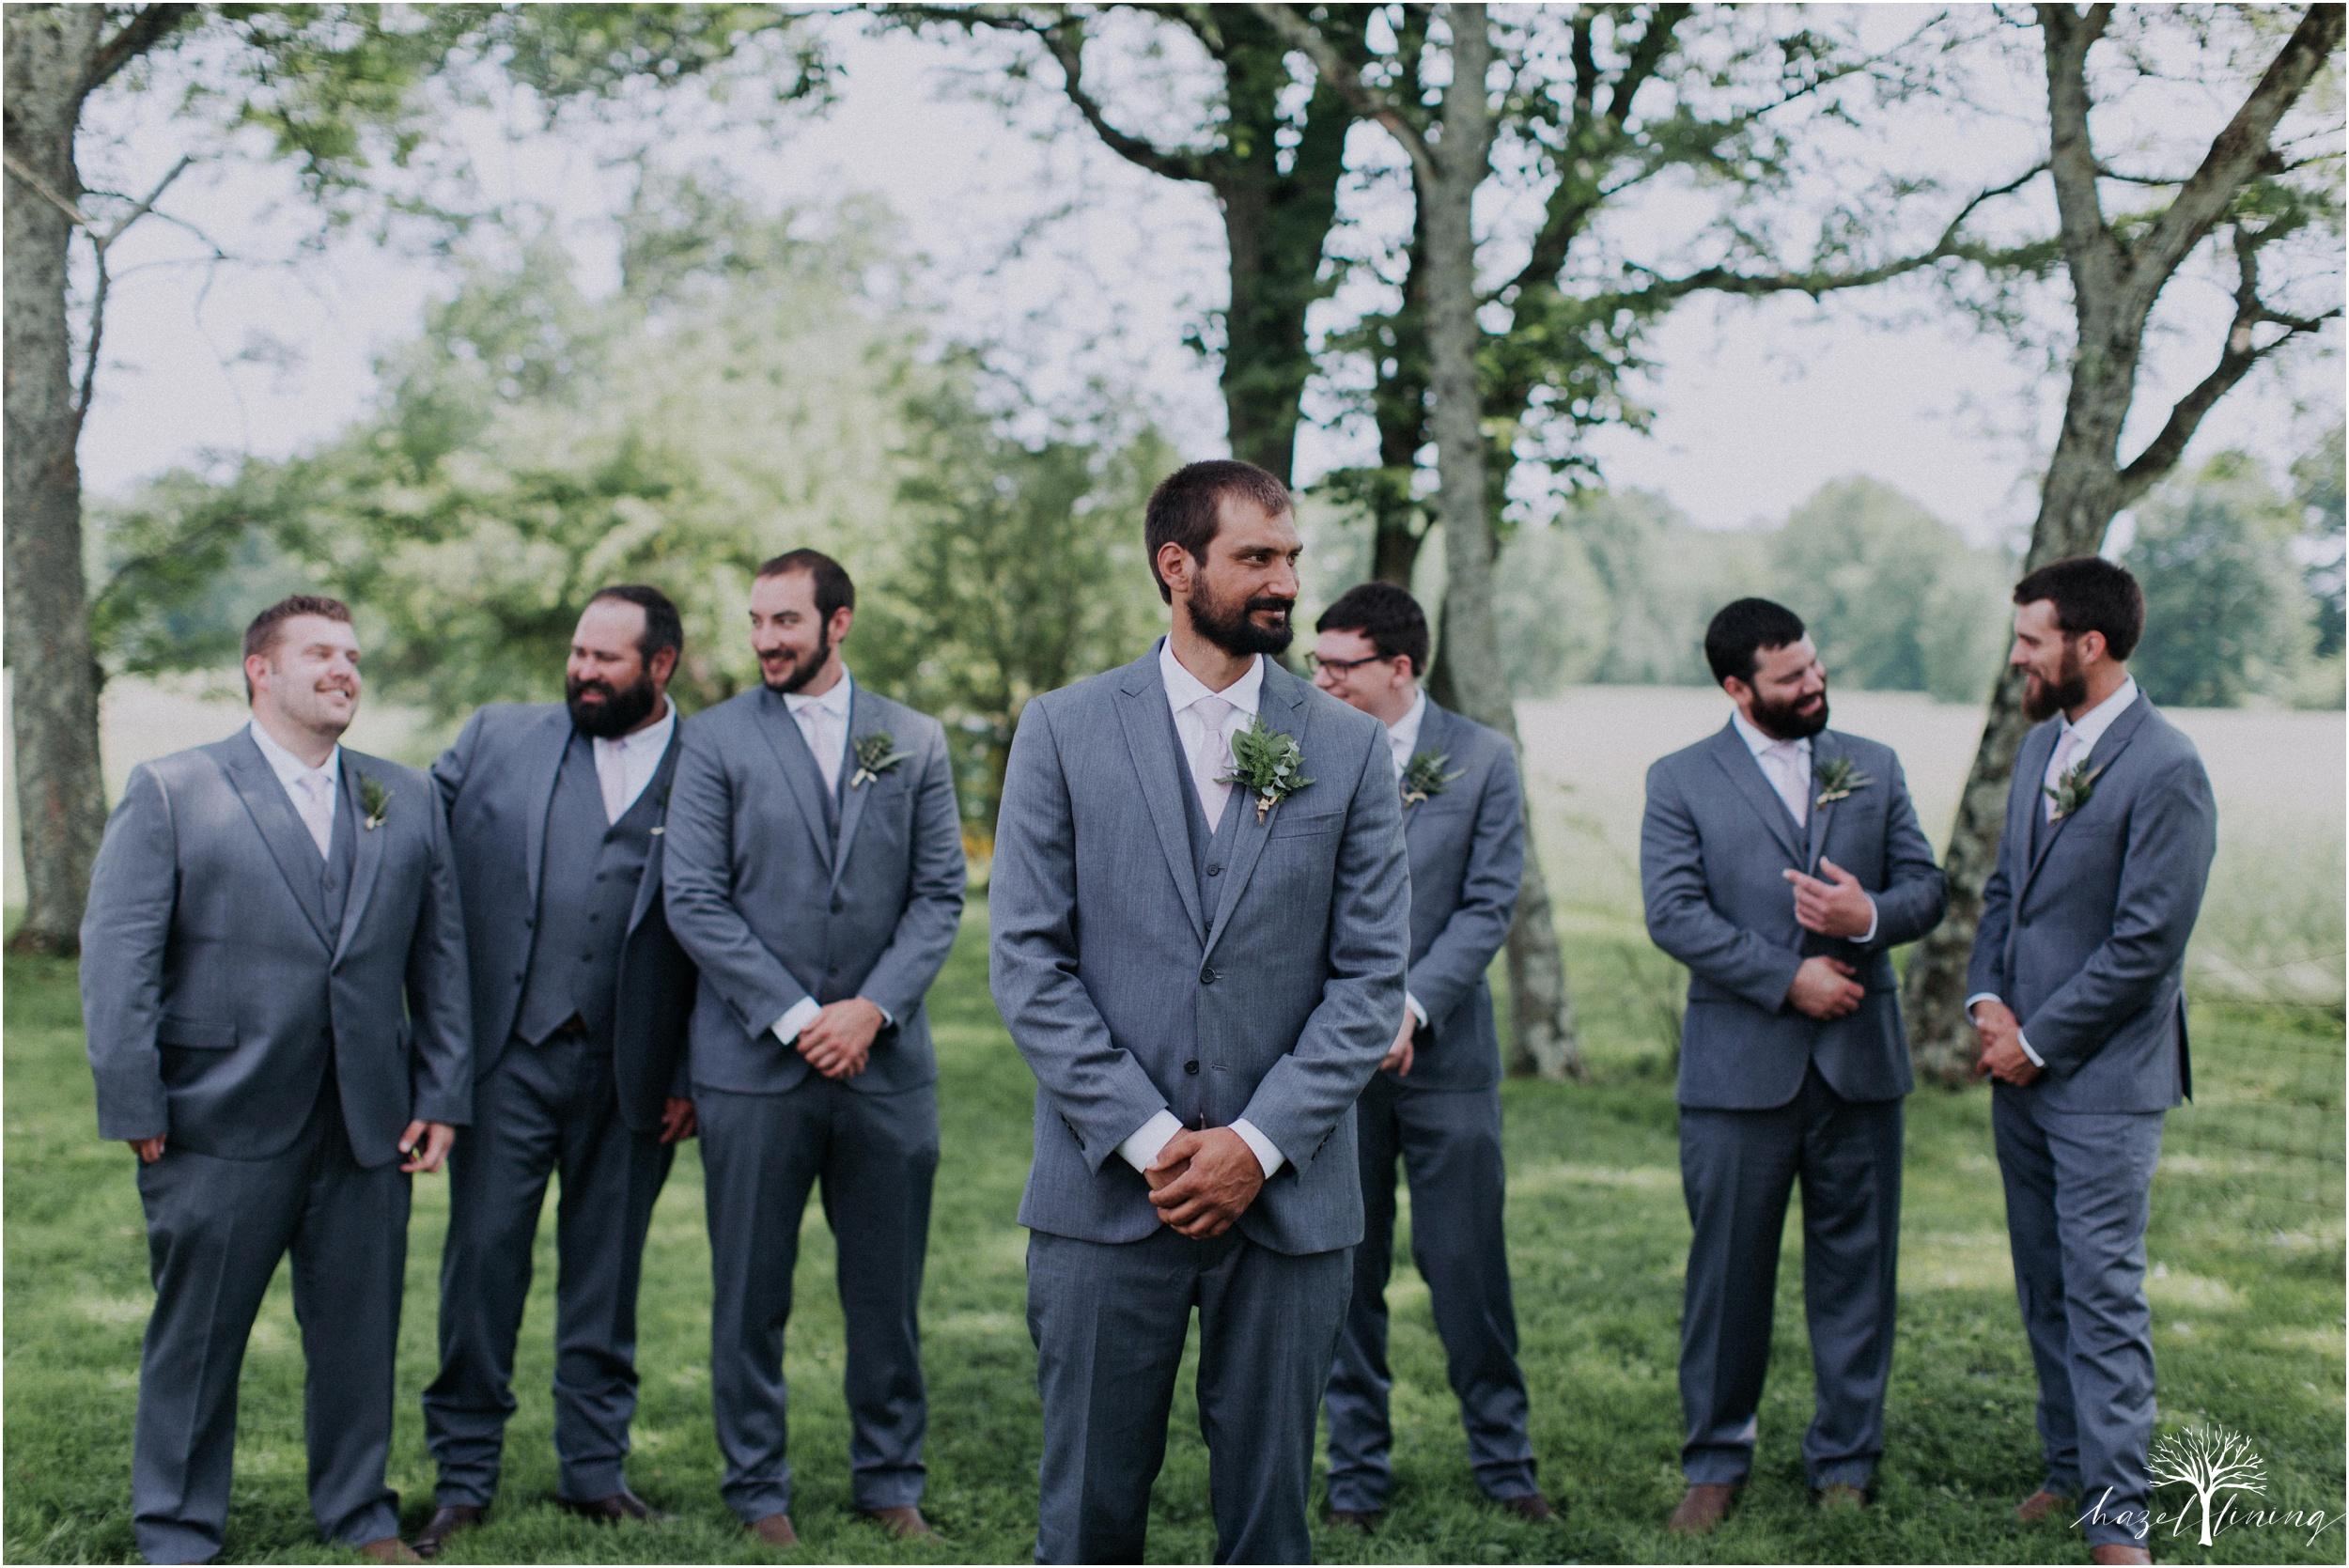 hazel-lining-travel-wedding-elopement-photography-lisa-landon-shoemaker-the-farm-bakery-and-events-bucks-county-quakertown-pennsylvania-summer-country-outdoor-farm-wedding_0047.jpg